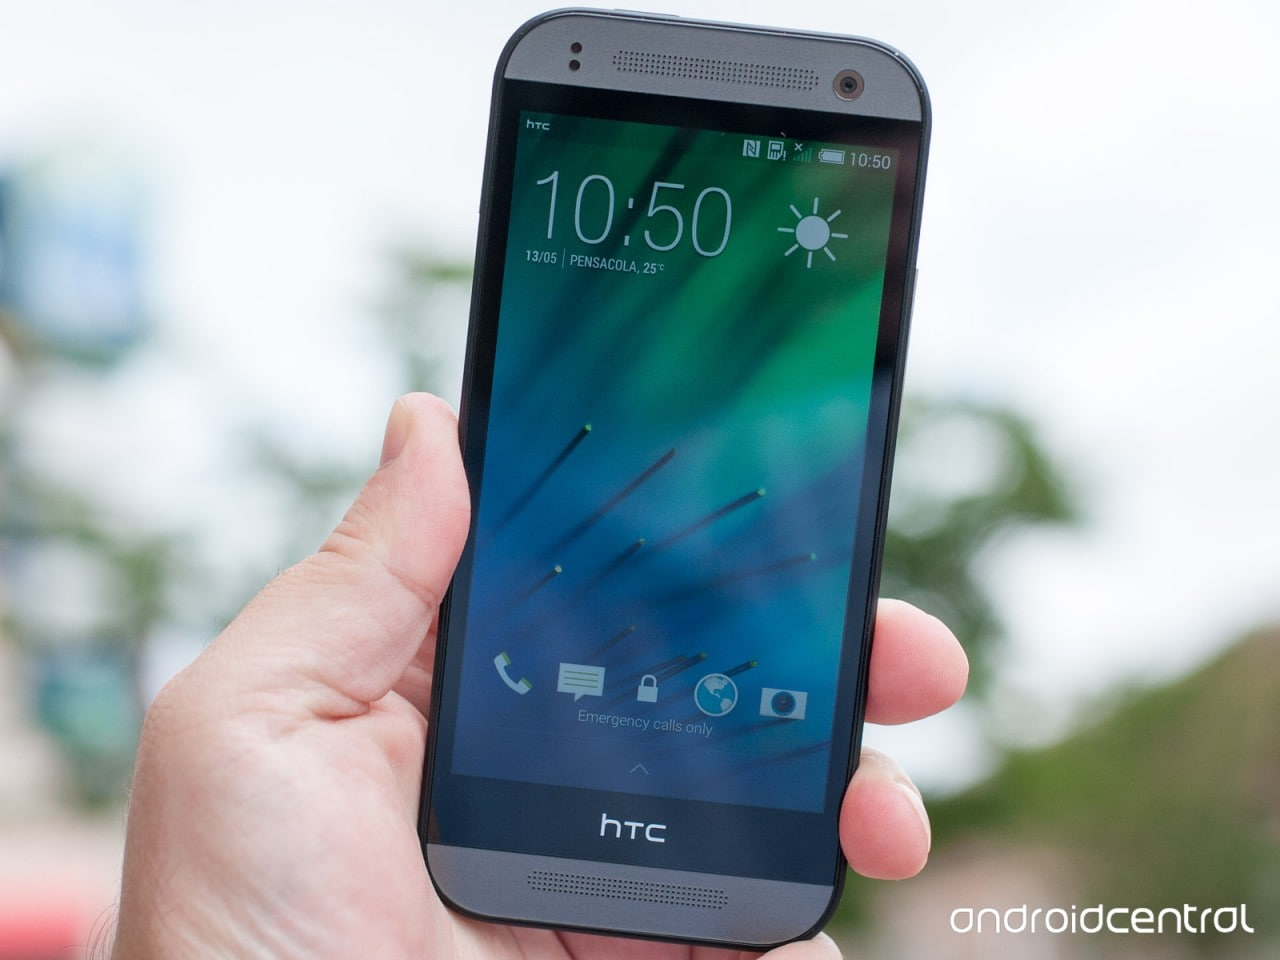 HTC One mini 2: hands-on (foto e video)